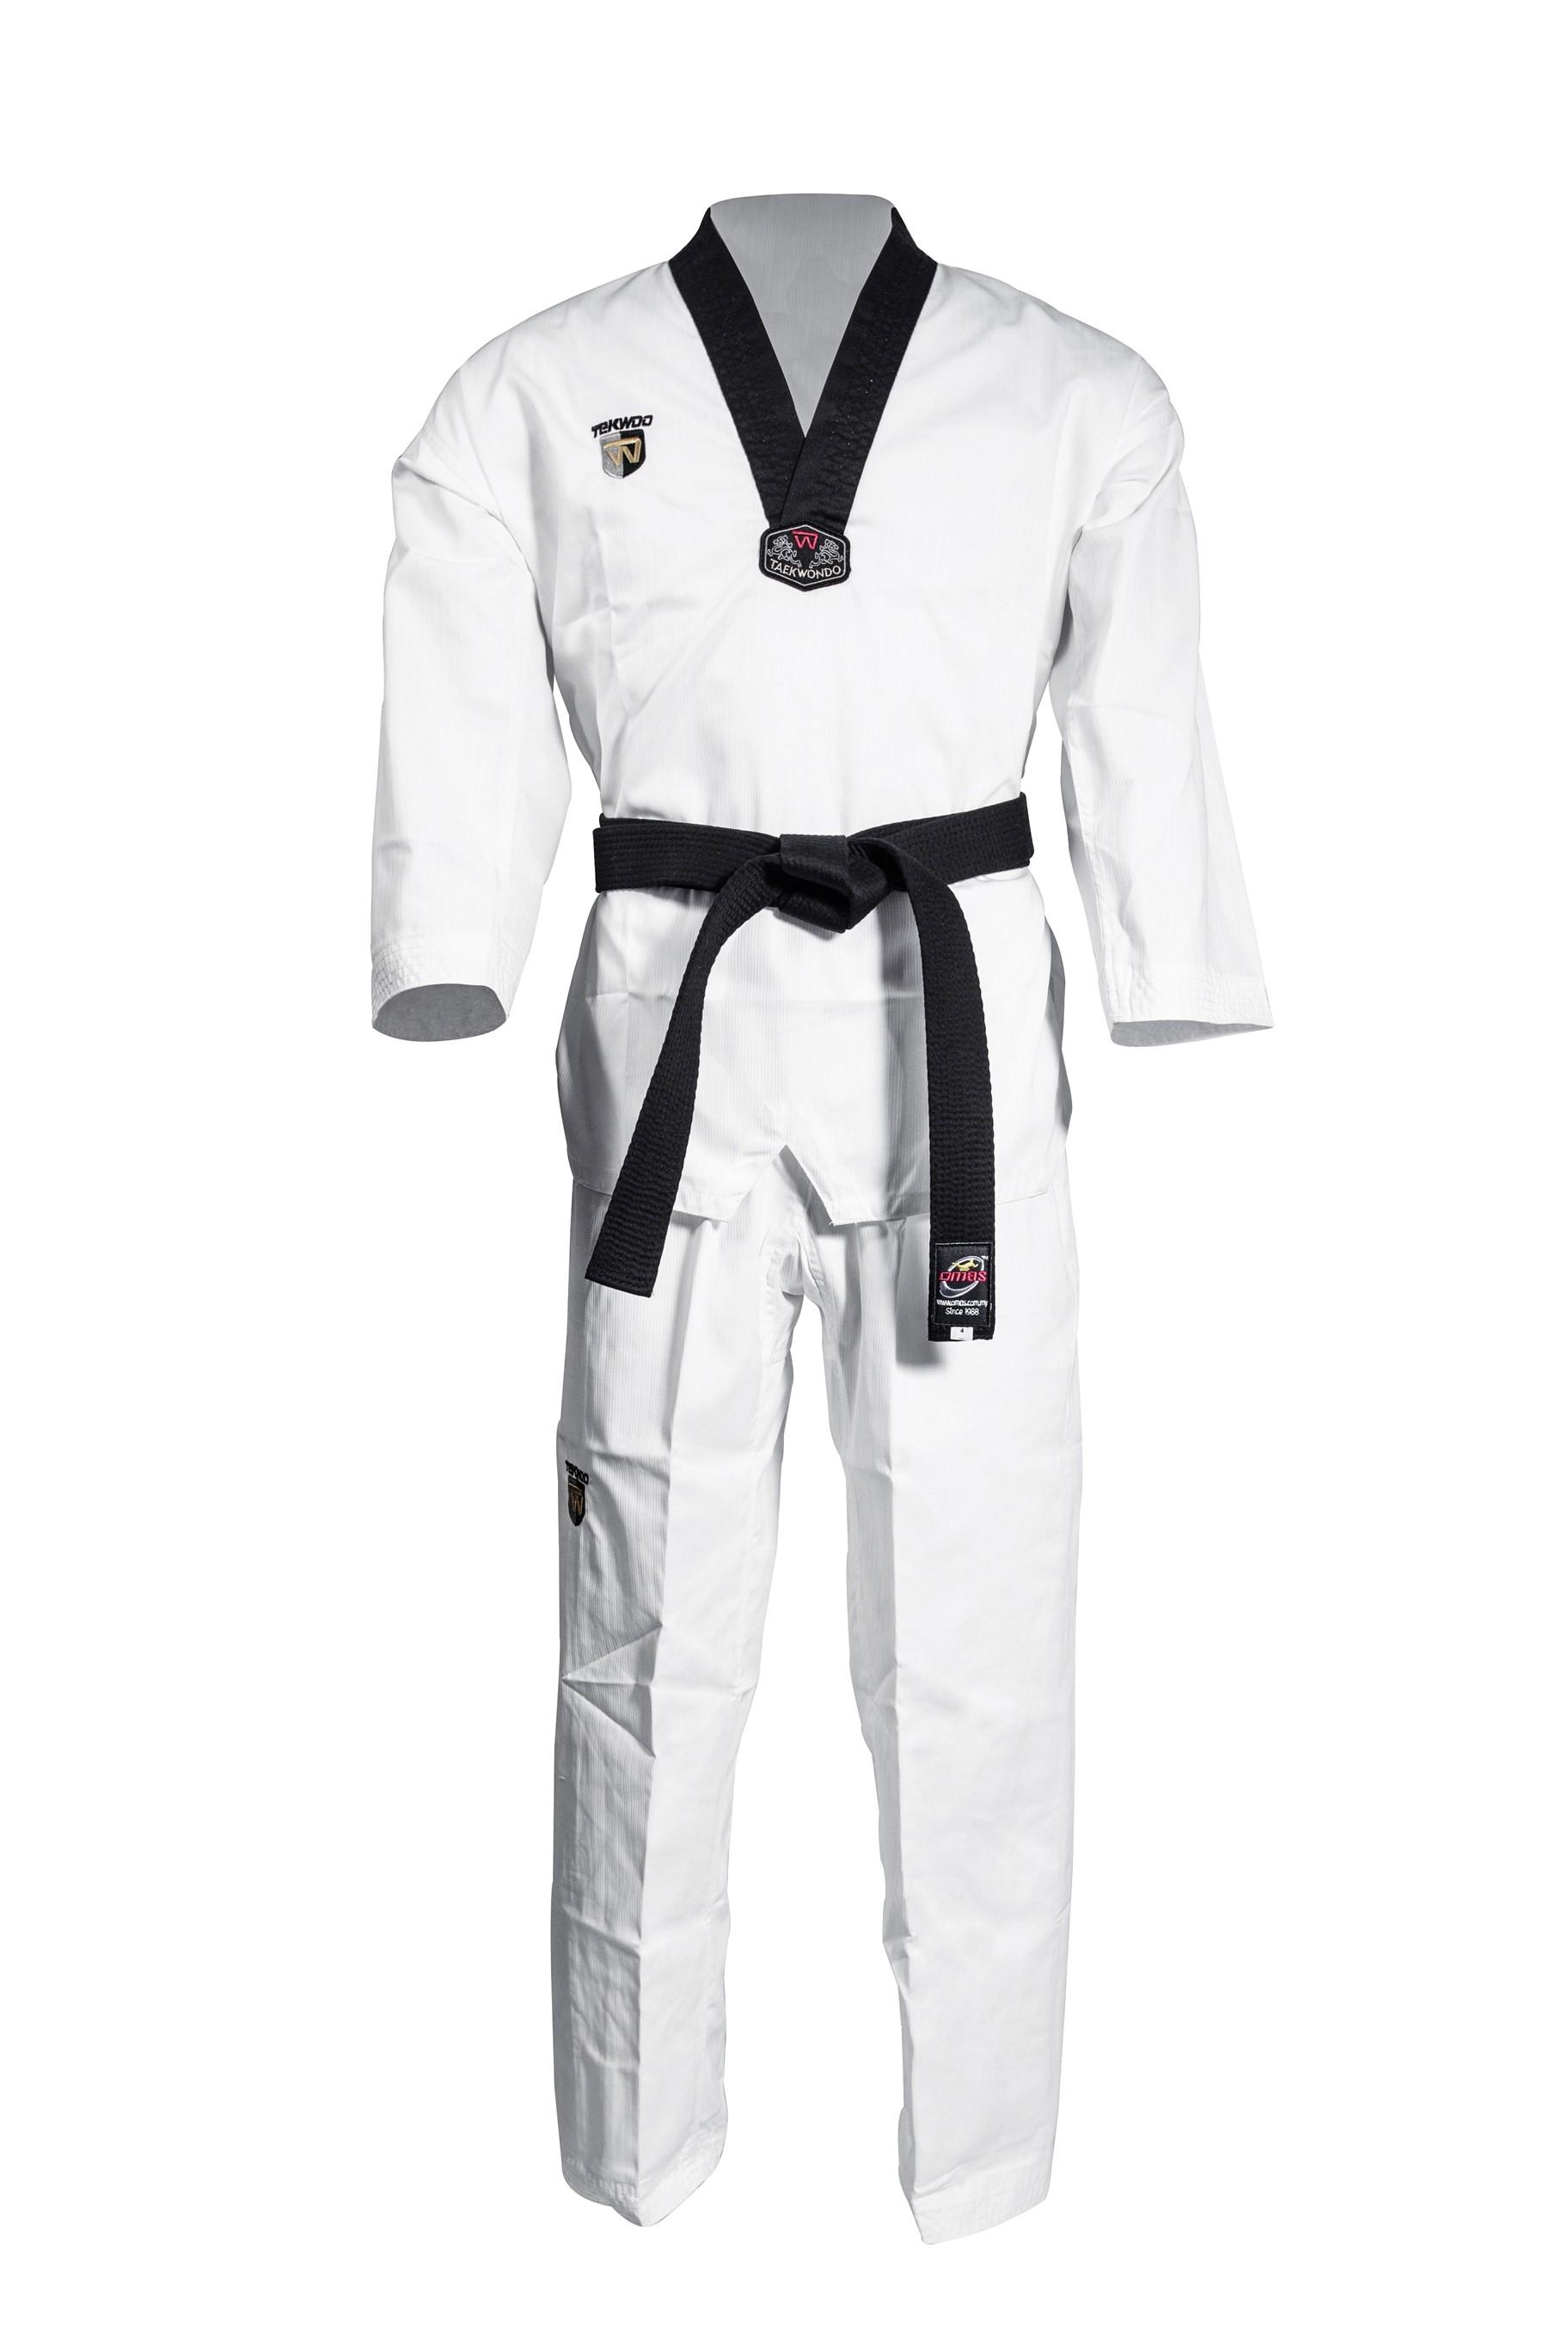 TAEWOO WT uniform